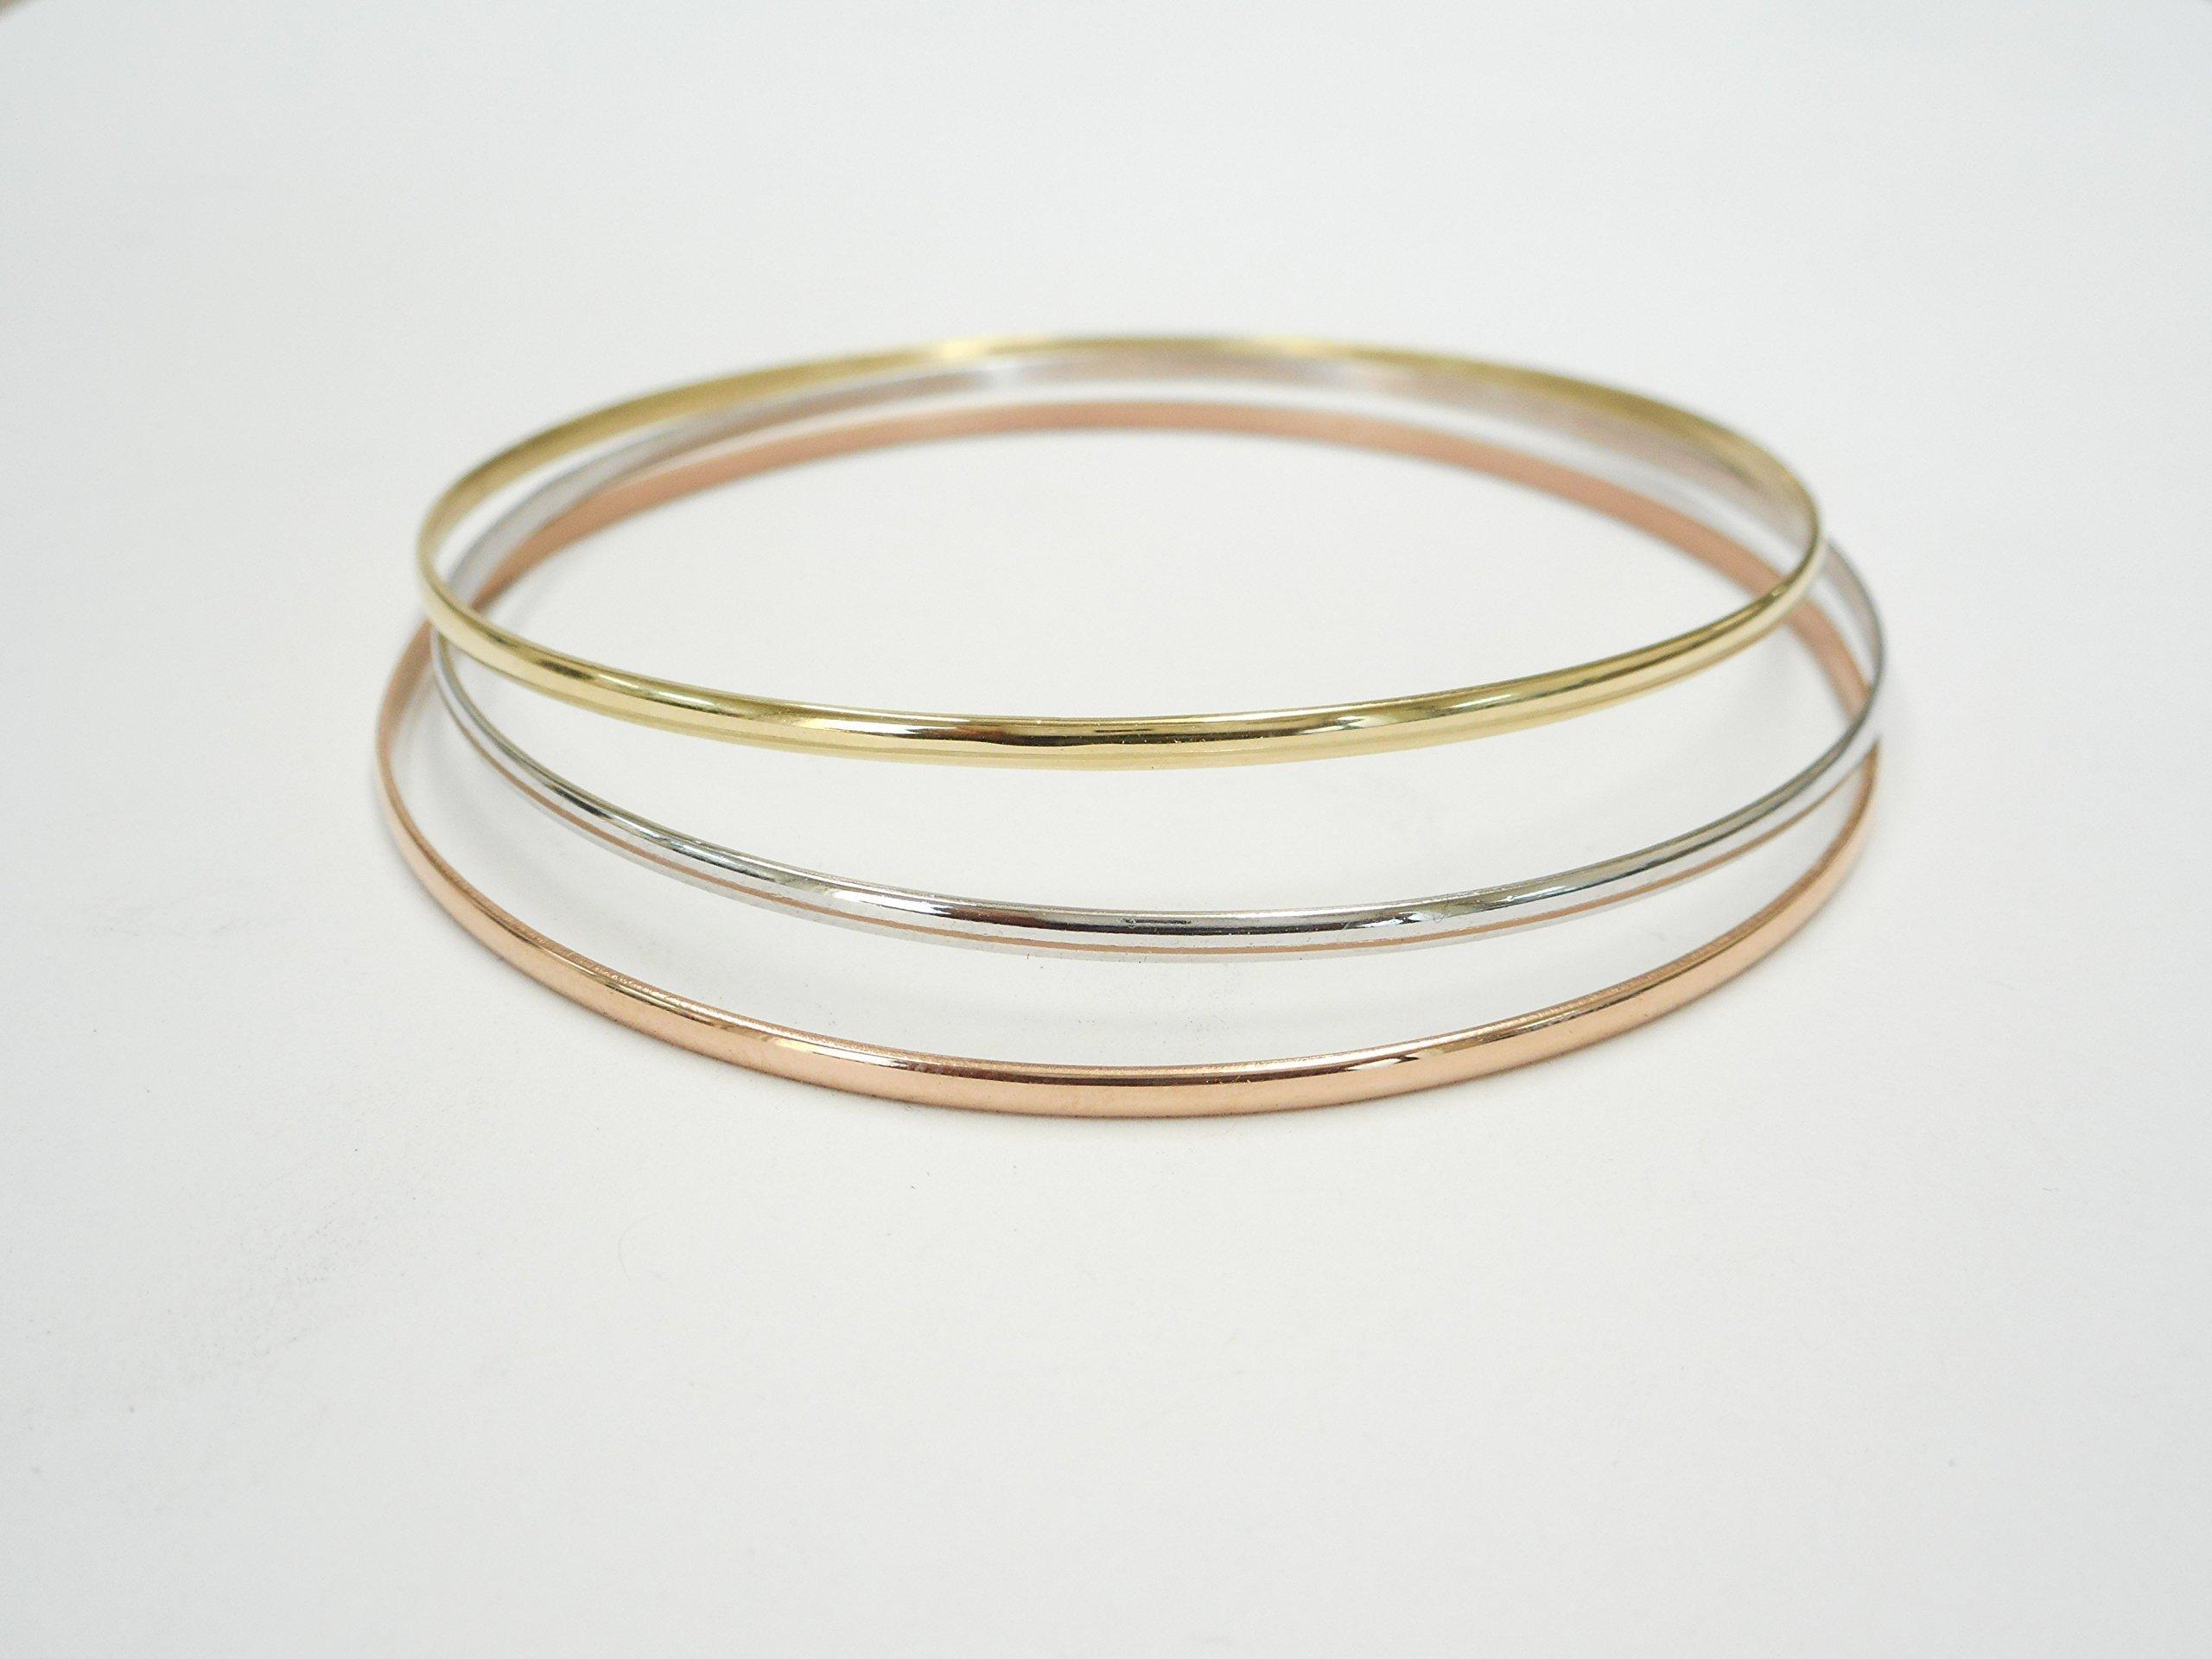 2.00 MM. Half Round 10 K &14 K Solid Gold Slip-On Stacking Bangle/Bracelets Tricolor SOLID GOLD(NOT HOLLOW OR TUBE)